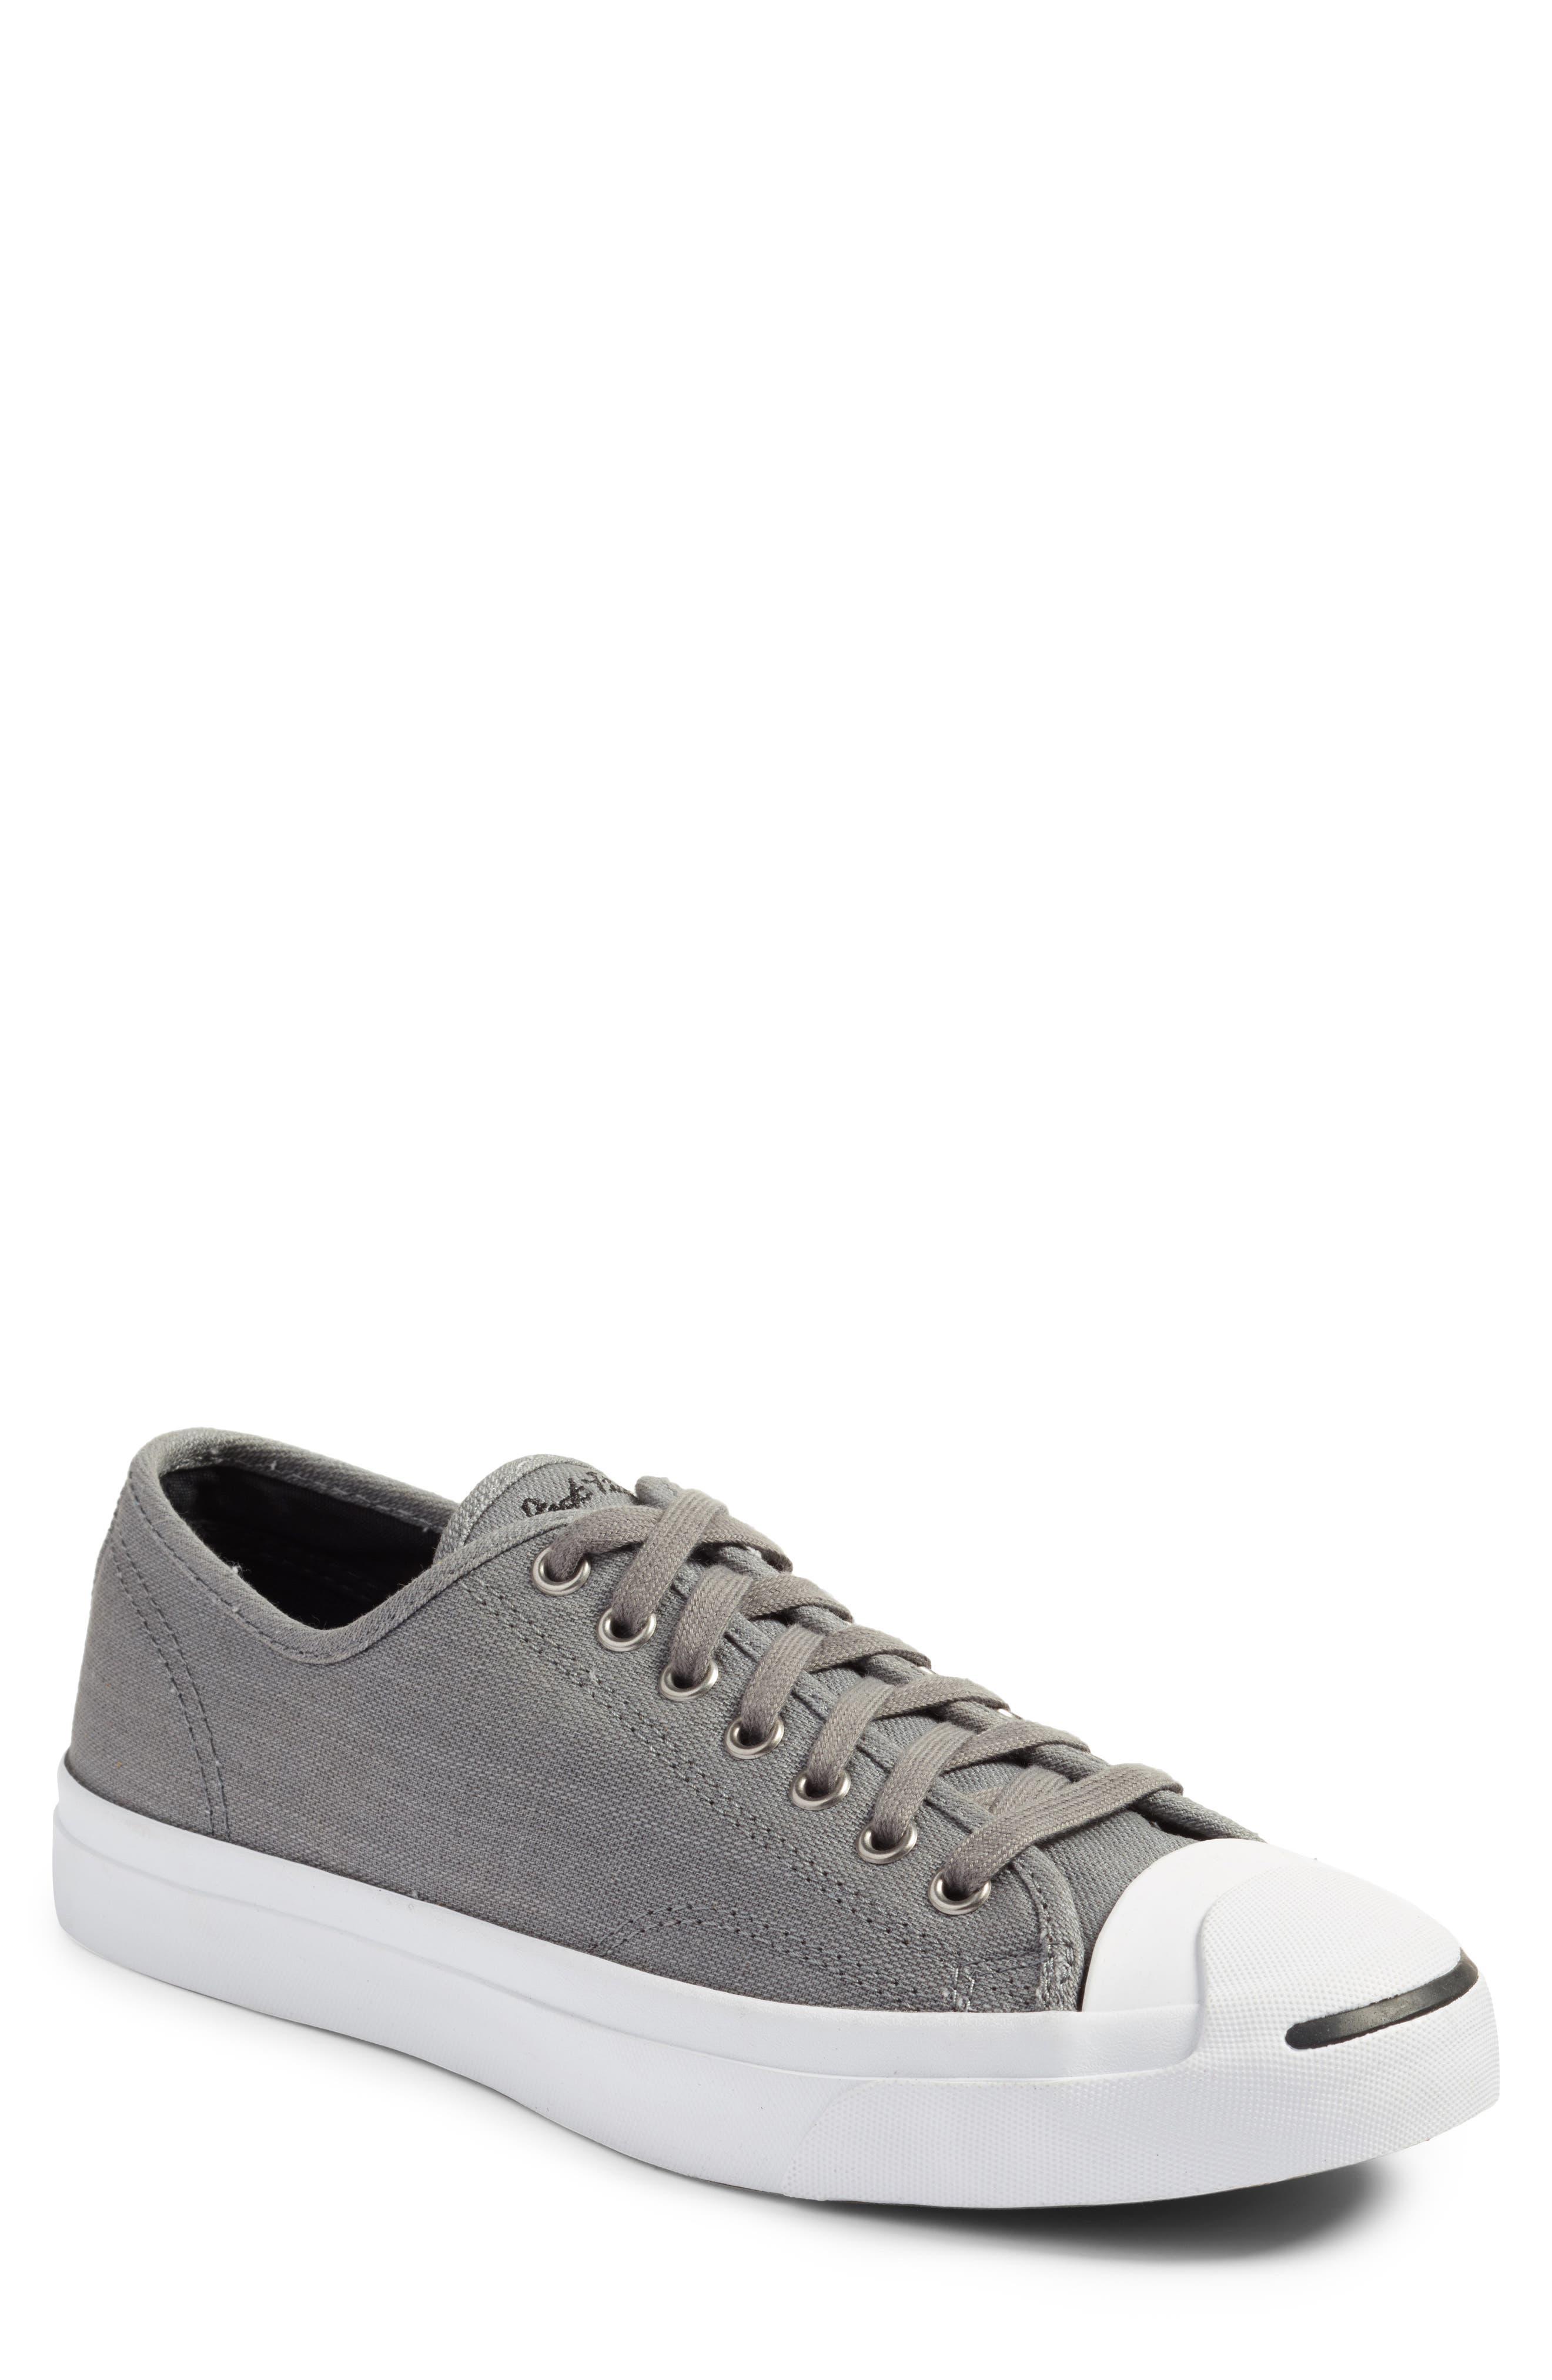 Converse Jack Purcell Ox Sneaker (Men)